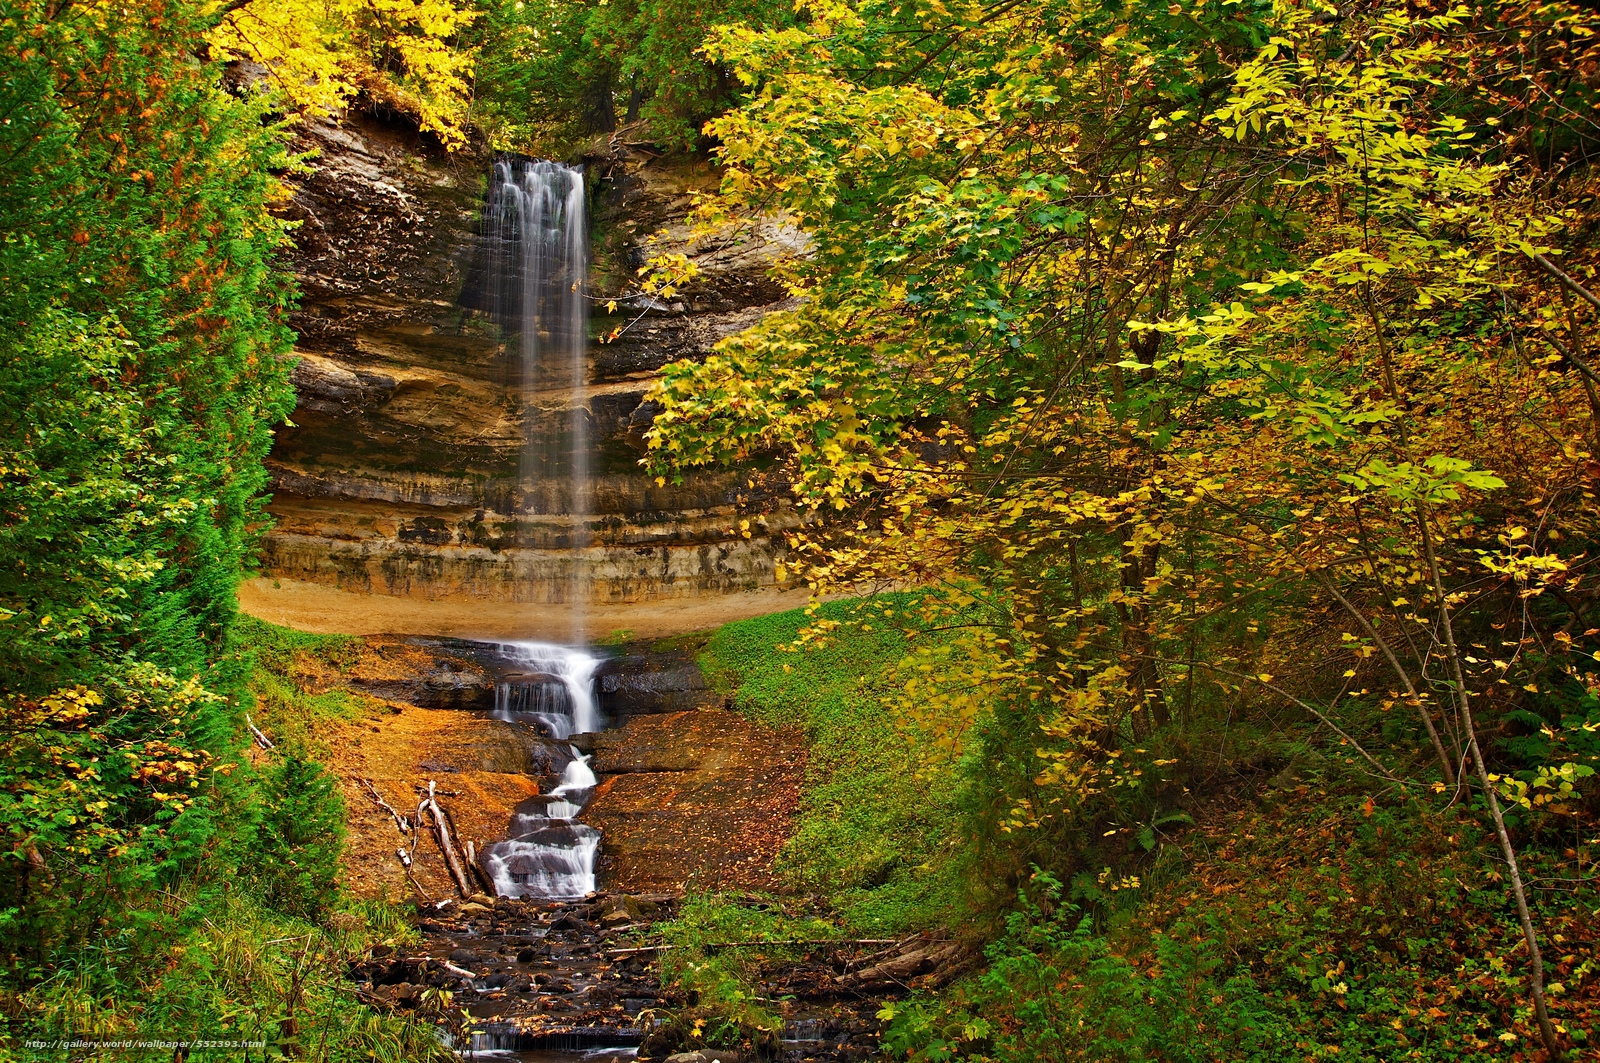 wallpaper autumn waterfall Rocks trees desktop wallpaper 1600x1063